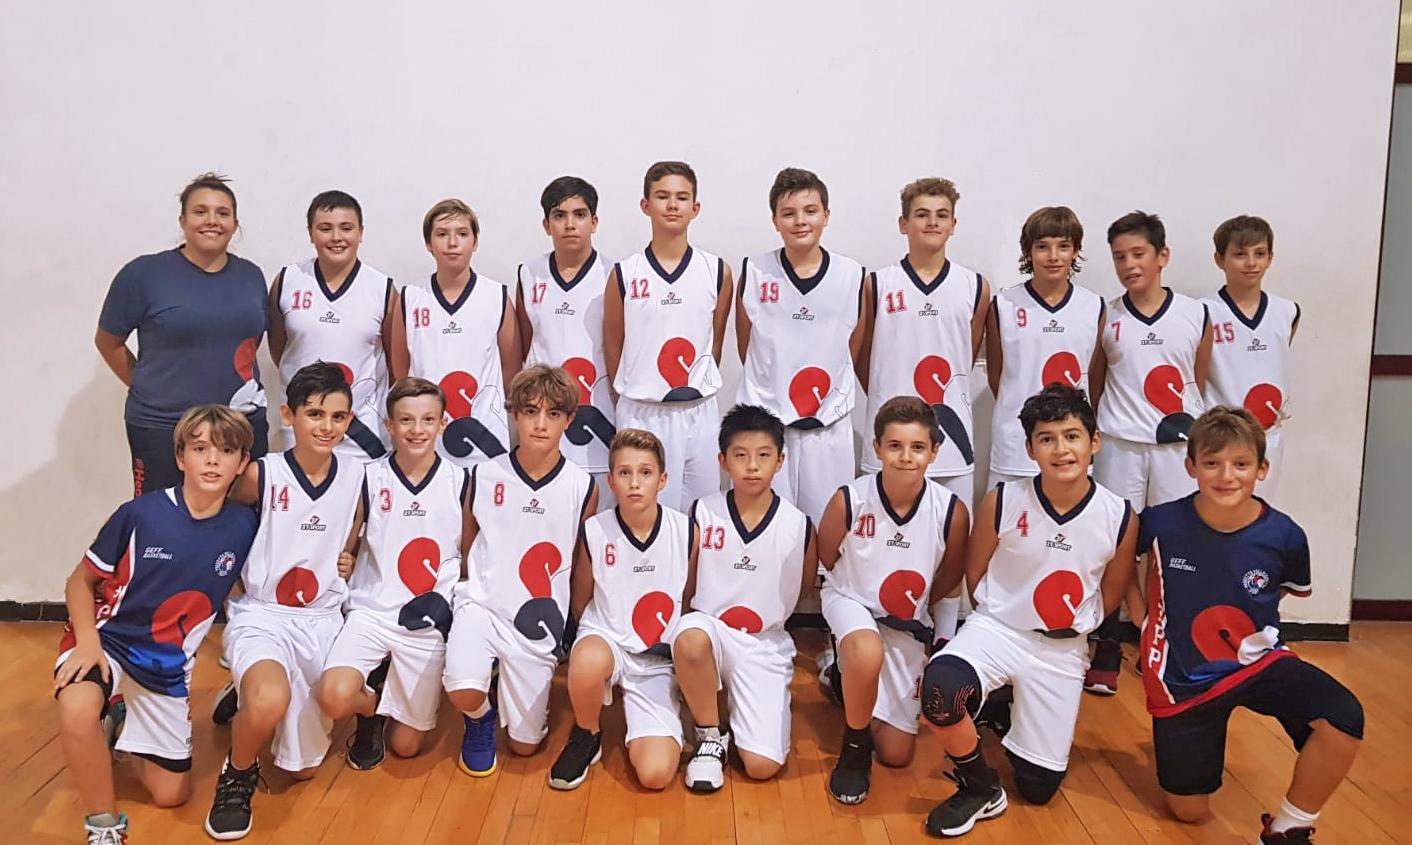 Squadra Under 13 Maschile 2019